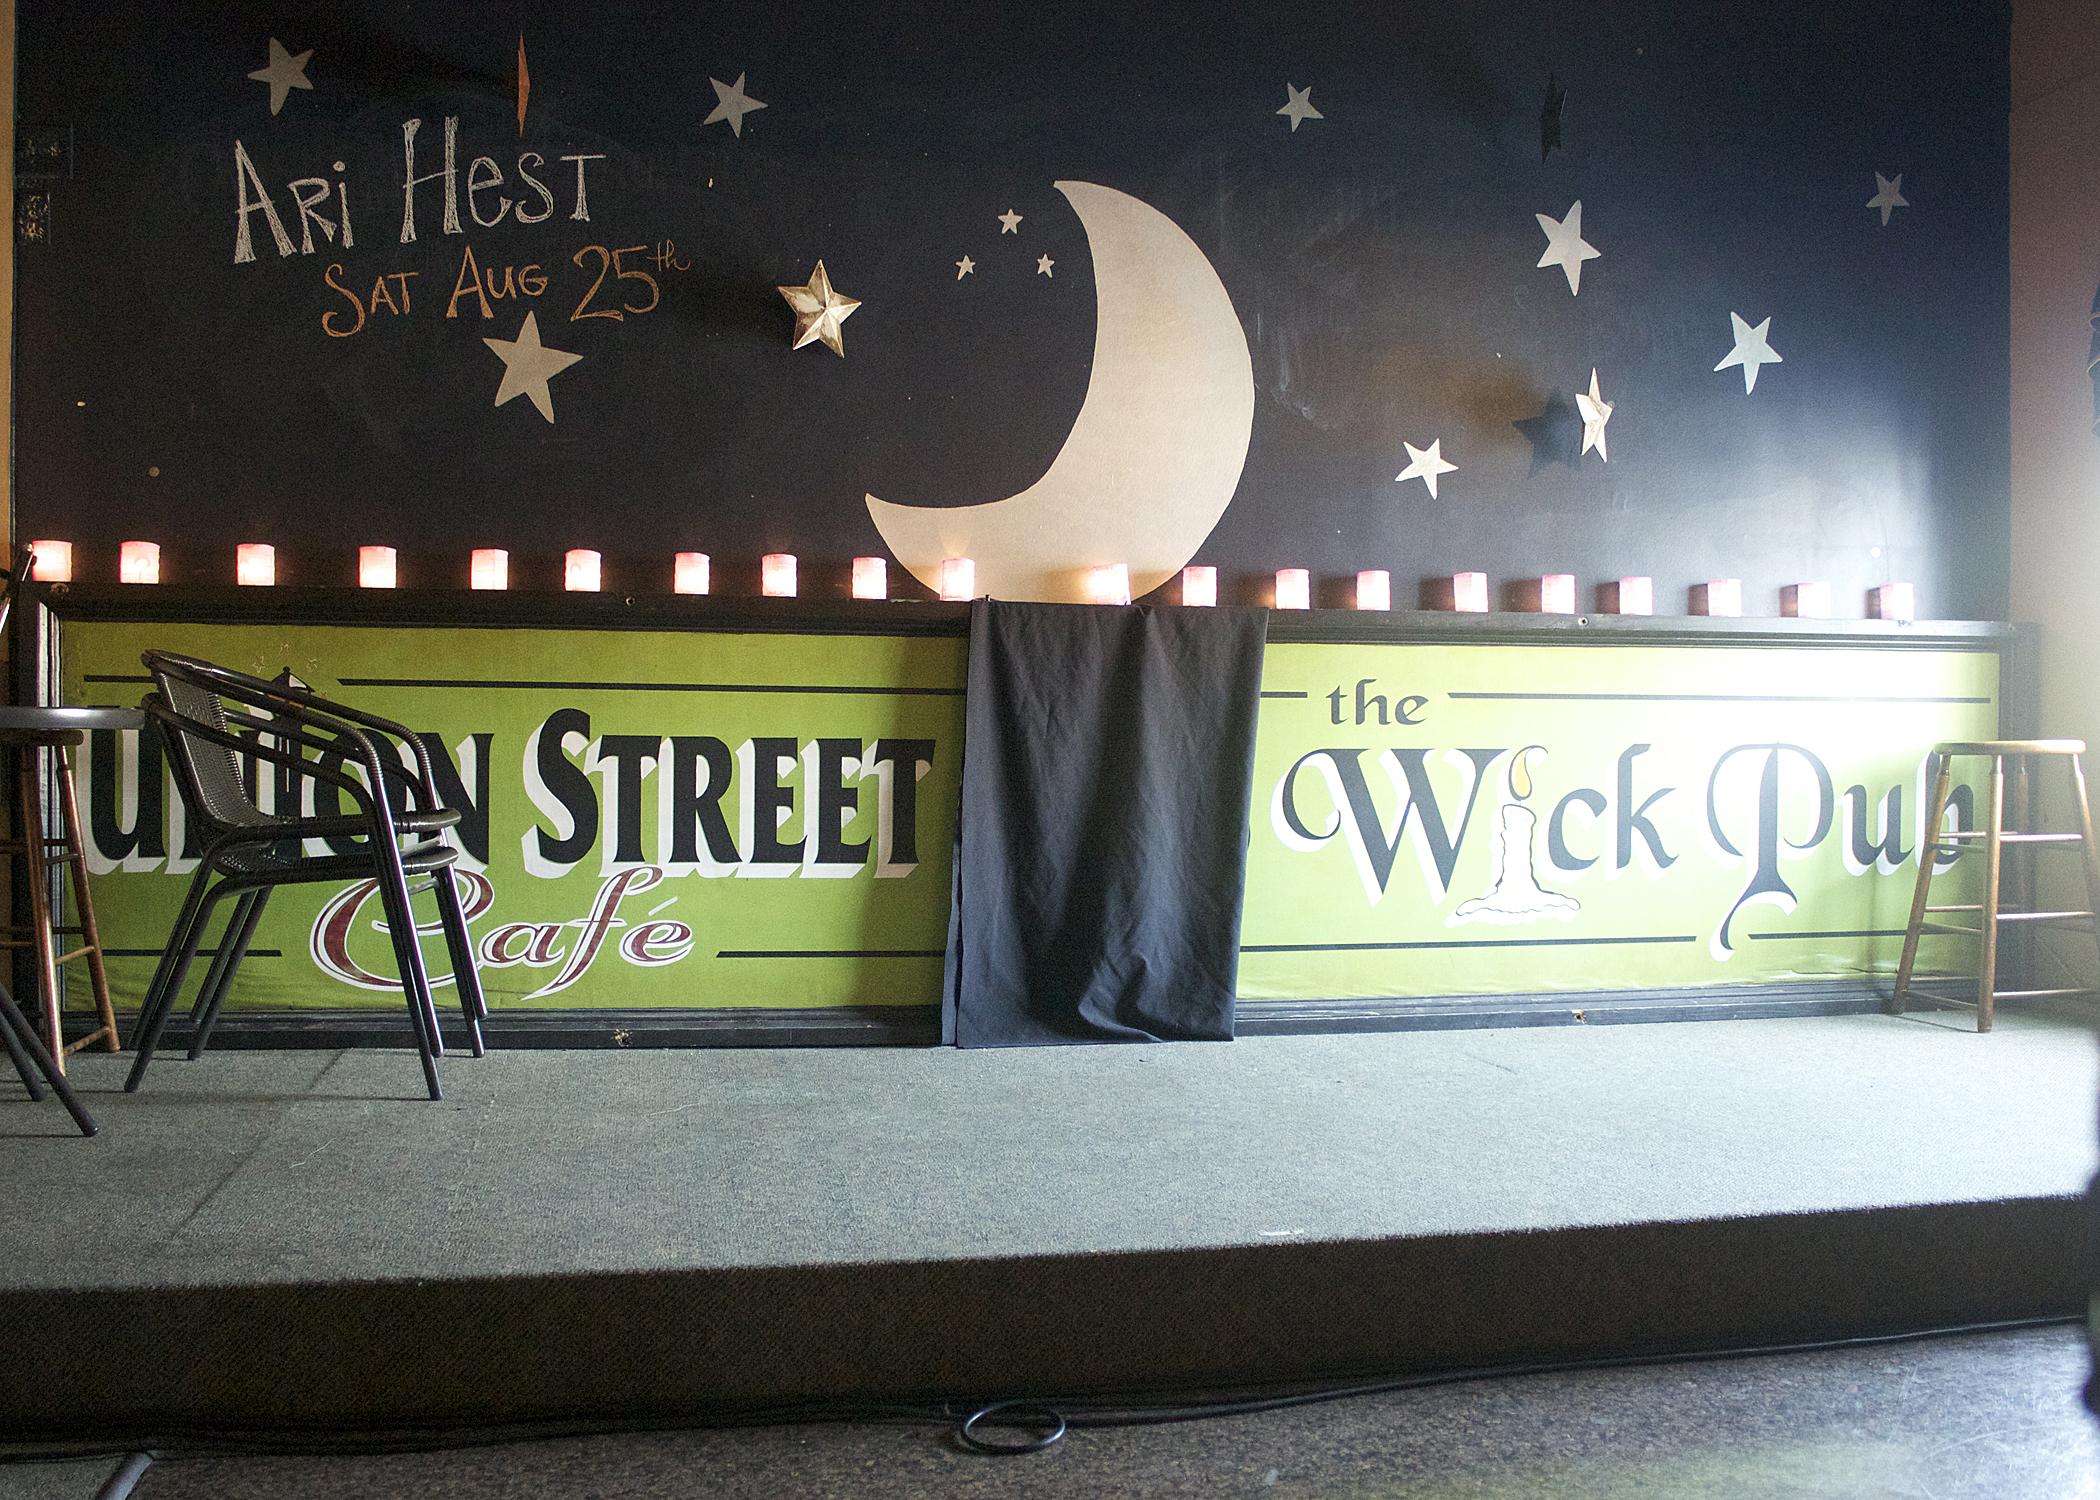 Union Street Cafe Brunswick